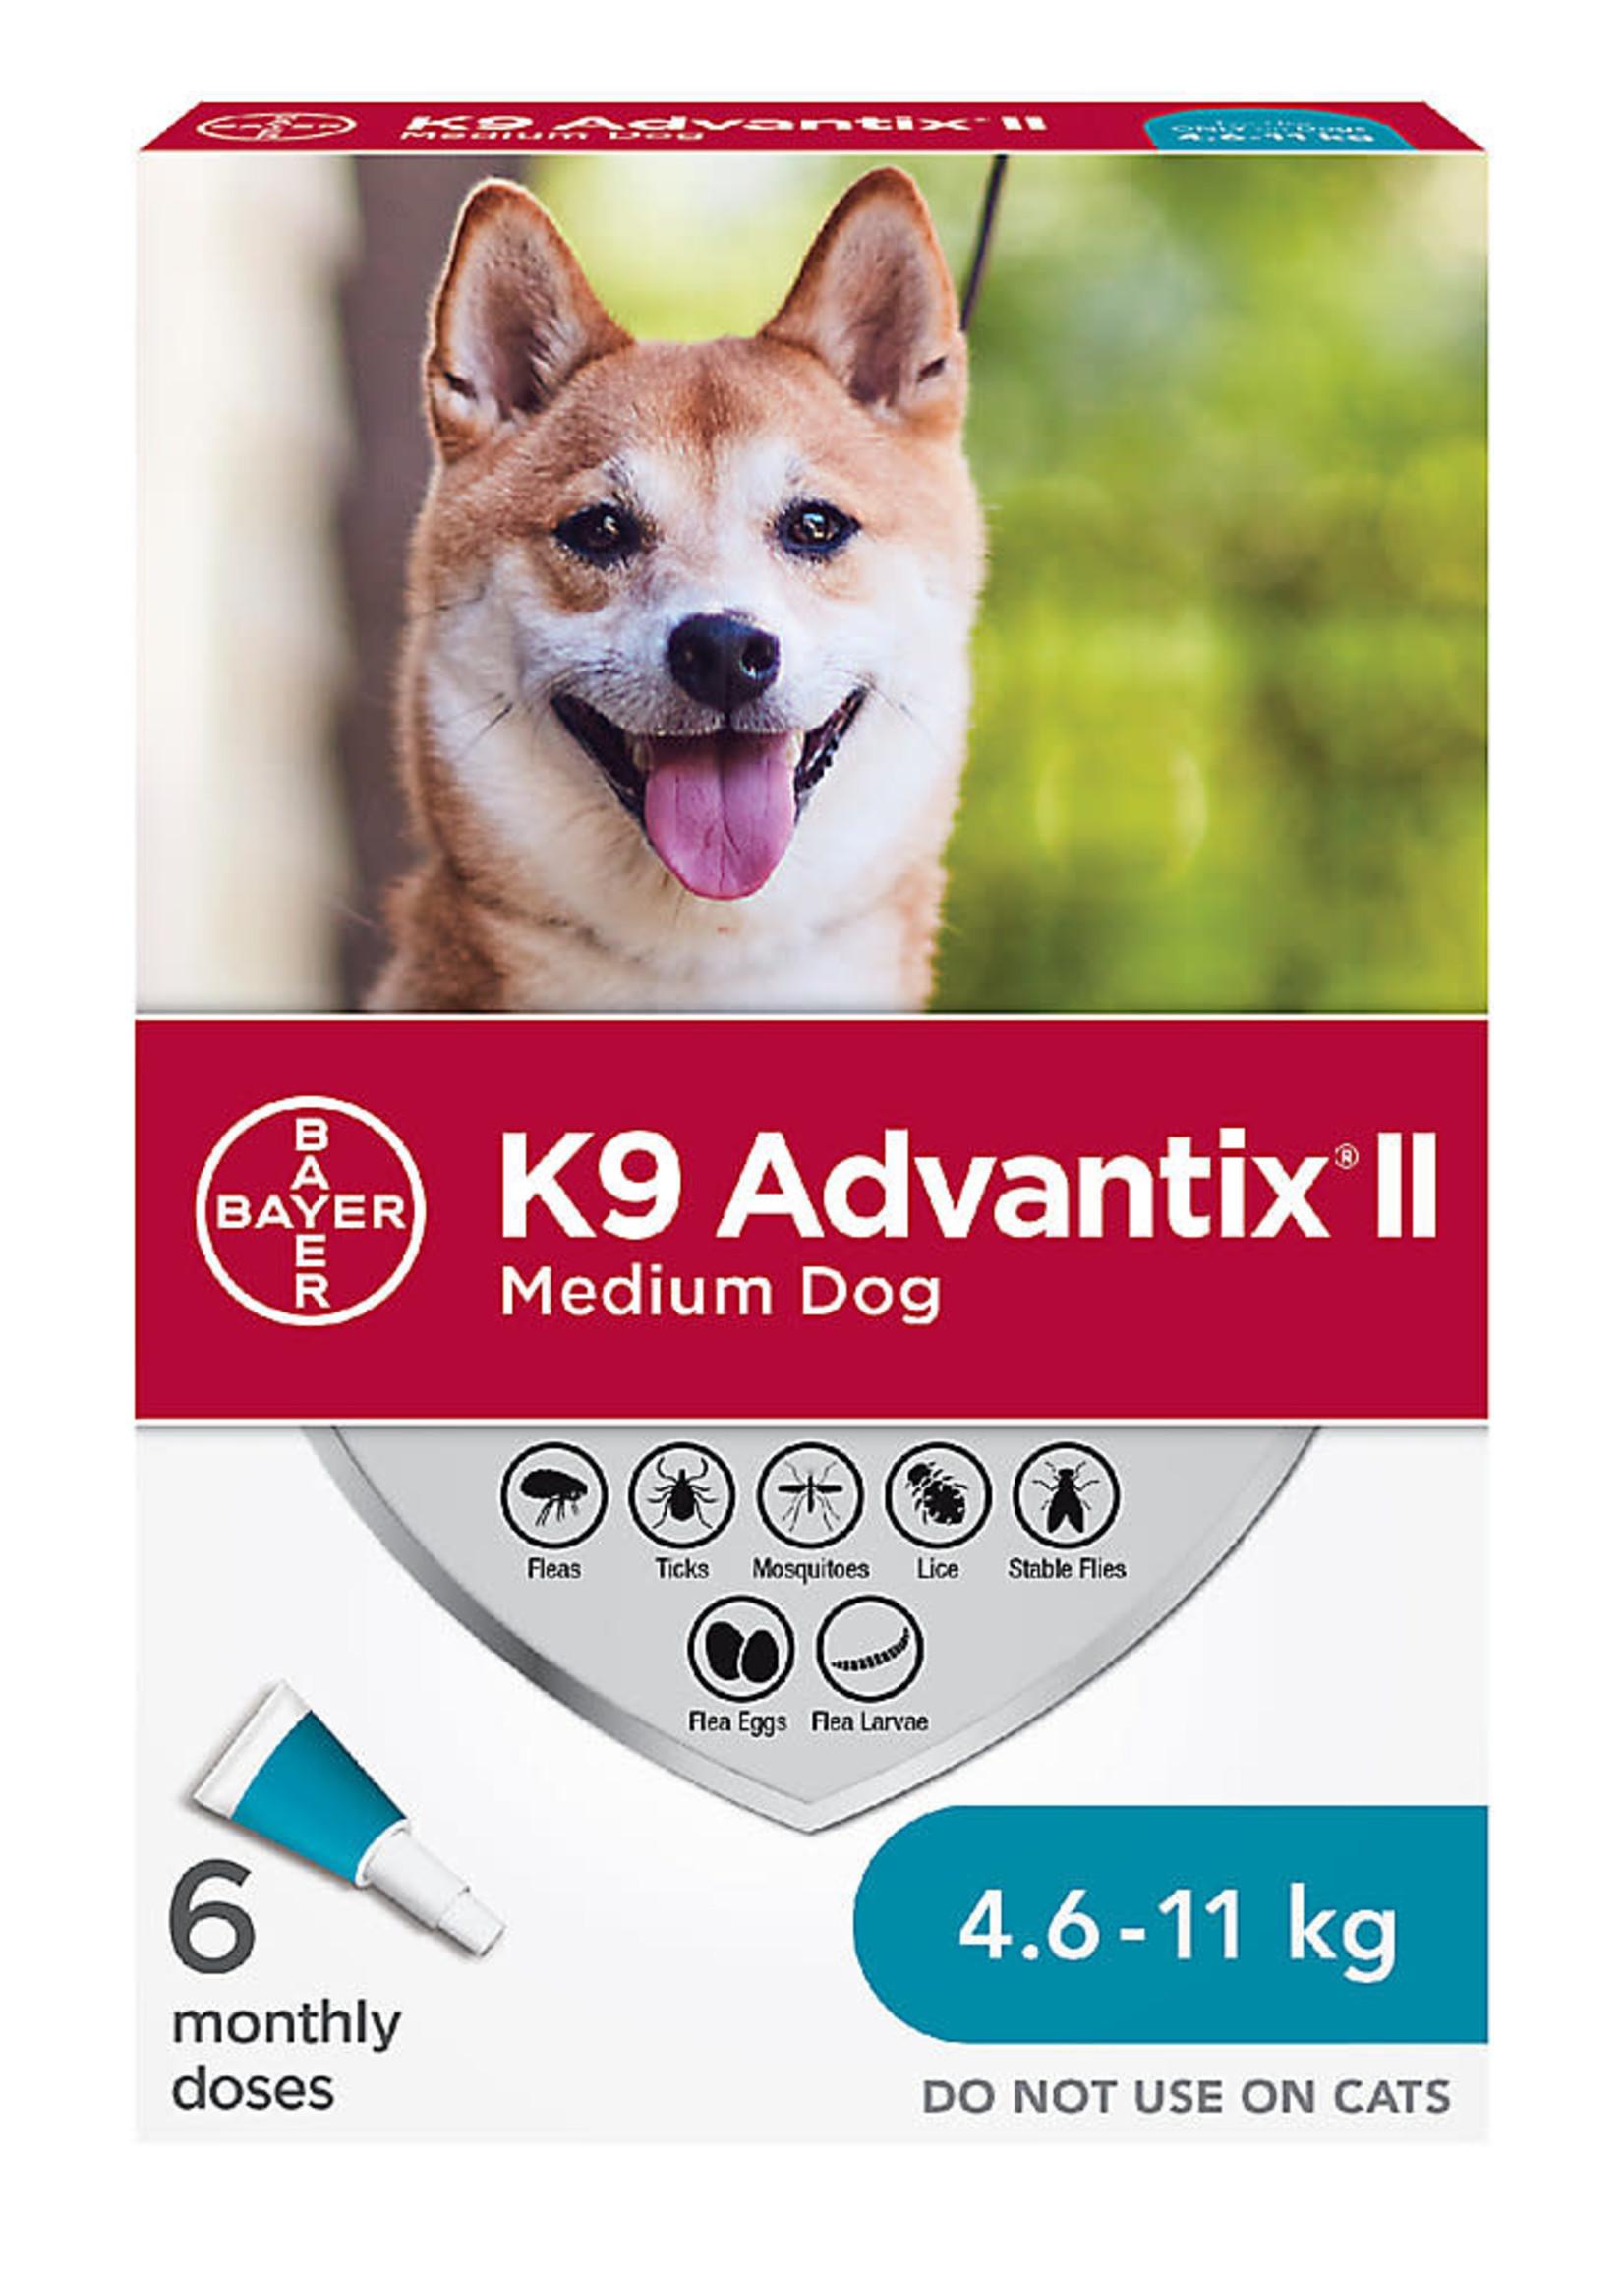 Bayer K9 Advantix® II - Medium Dog